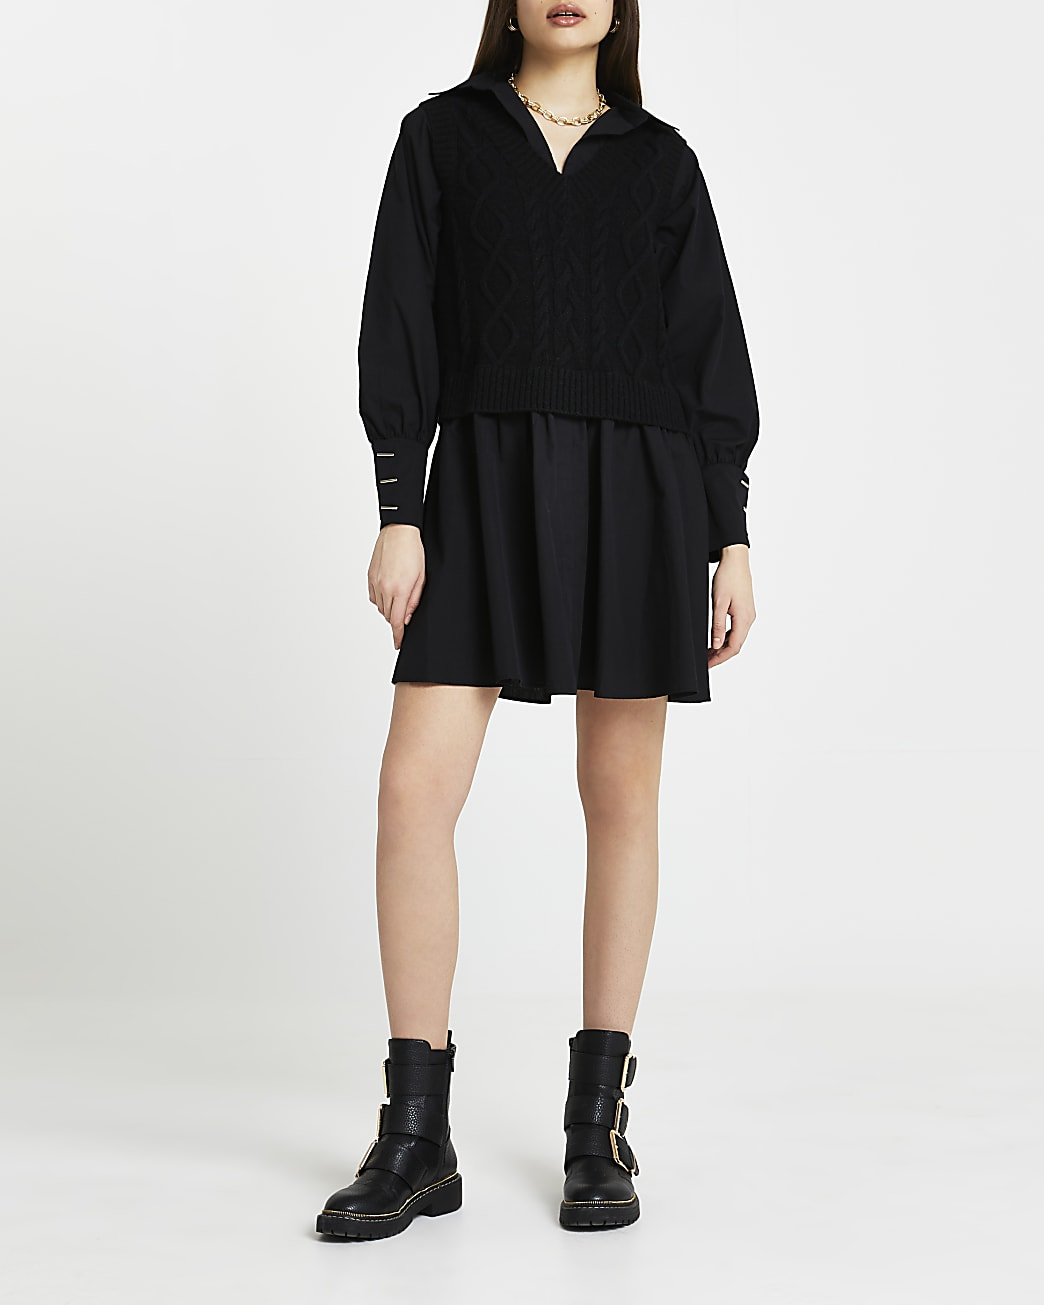 Black cable knit shirt dress